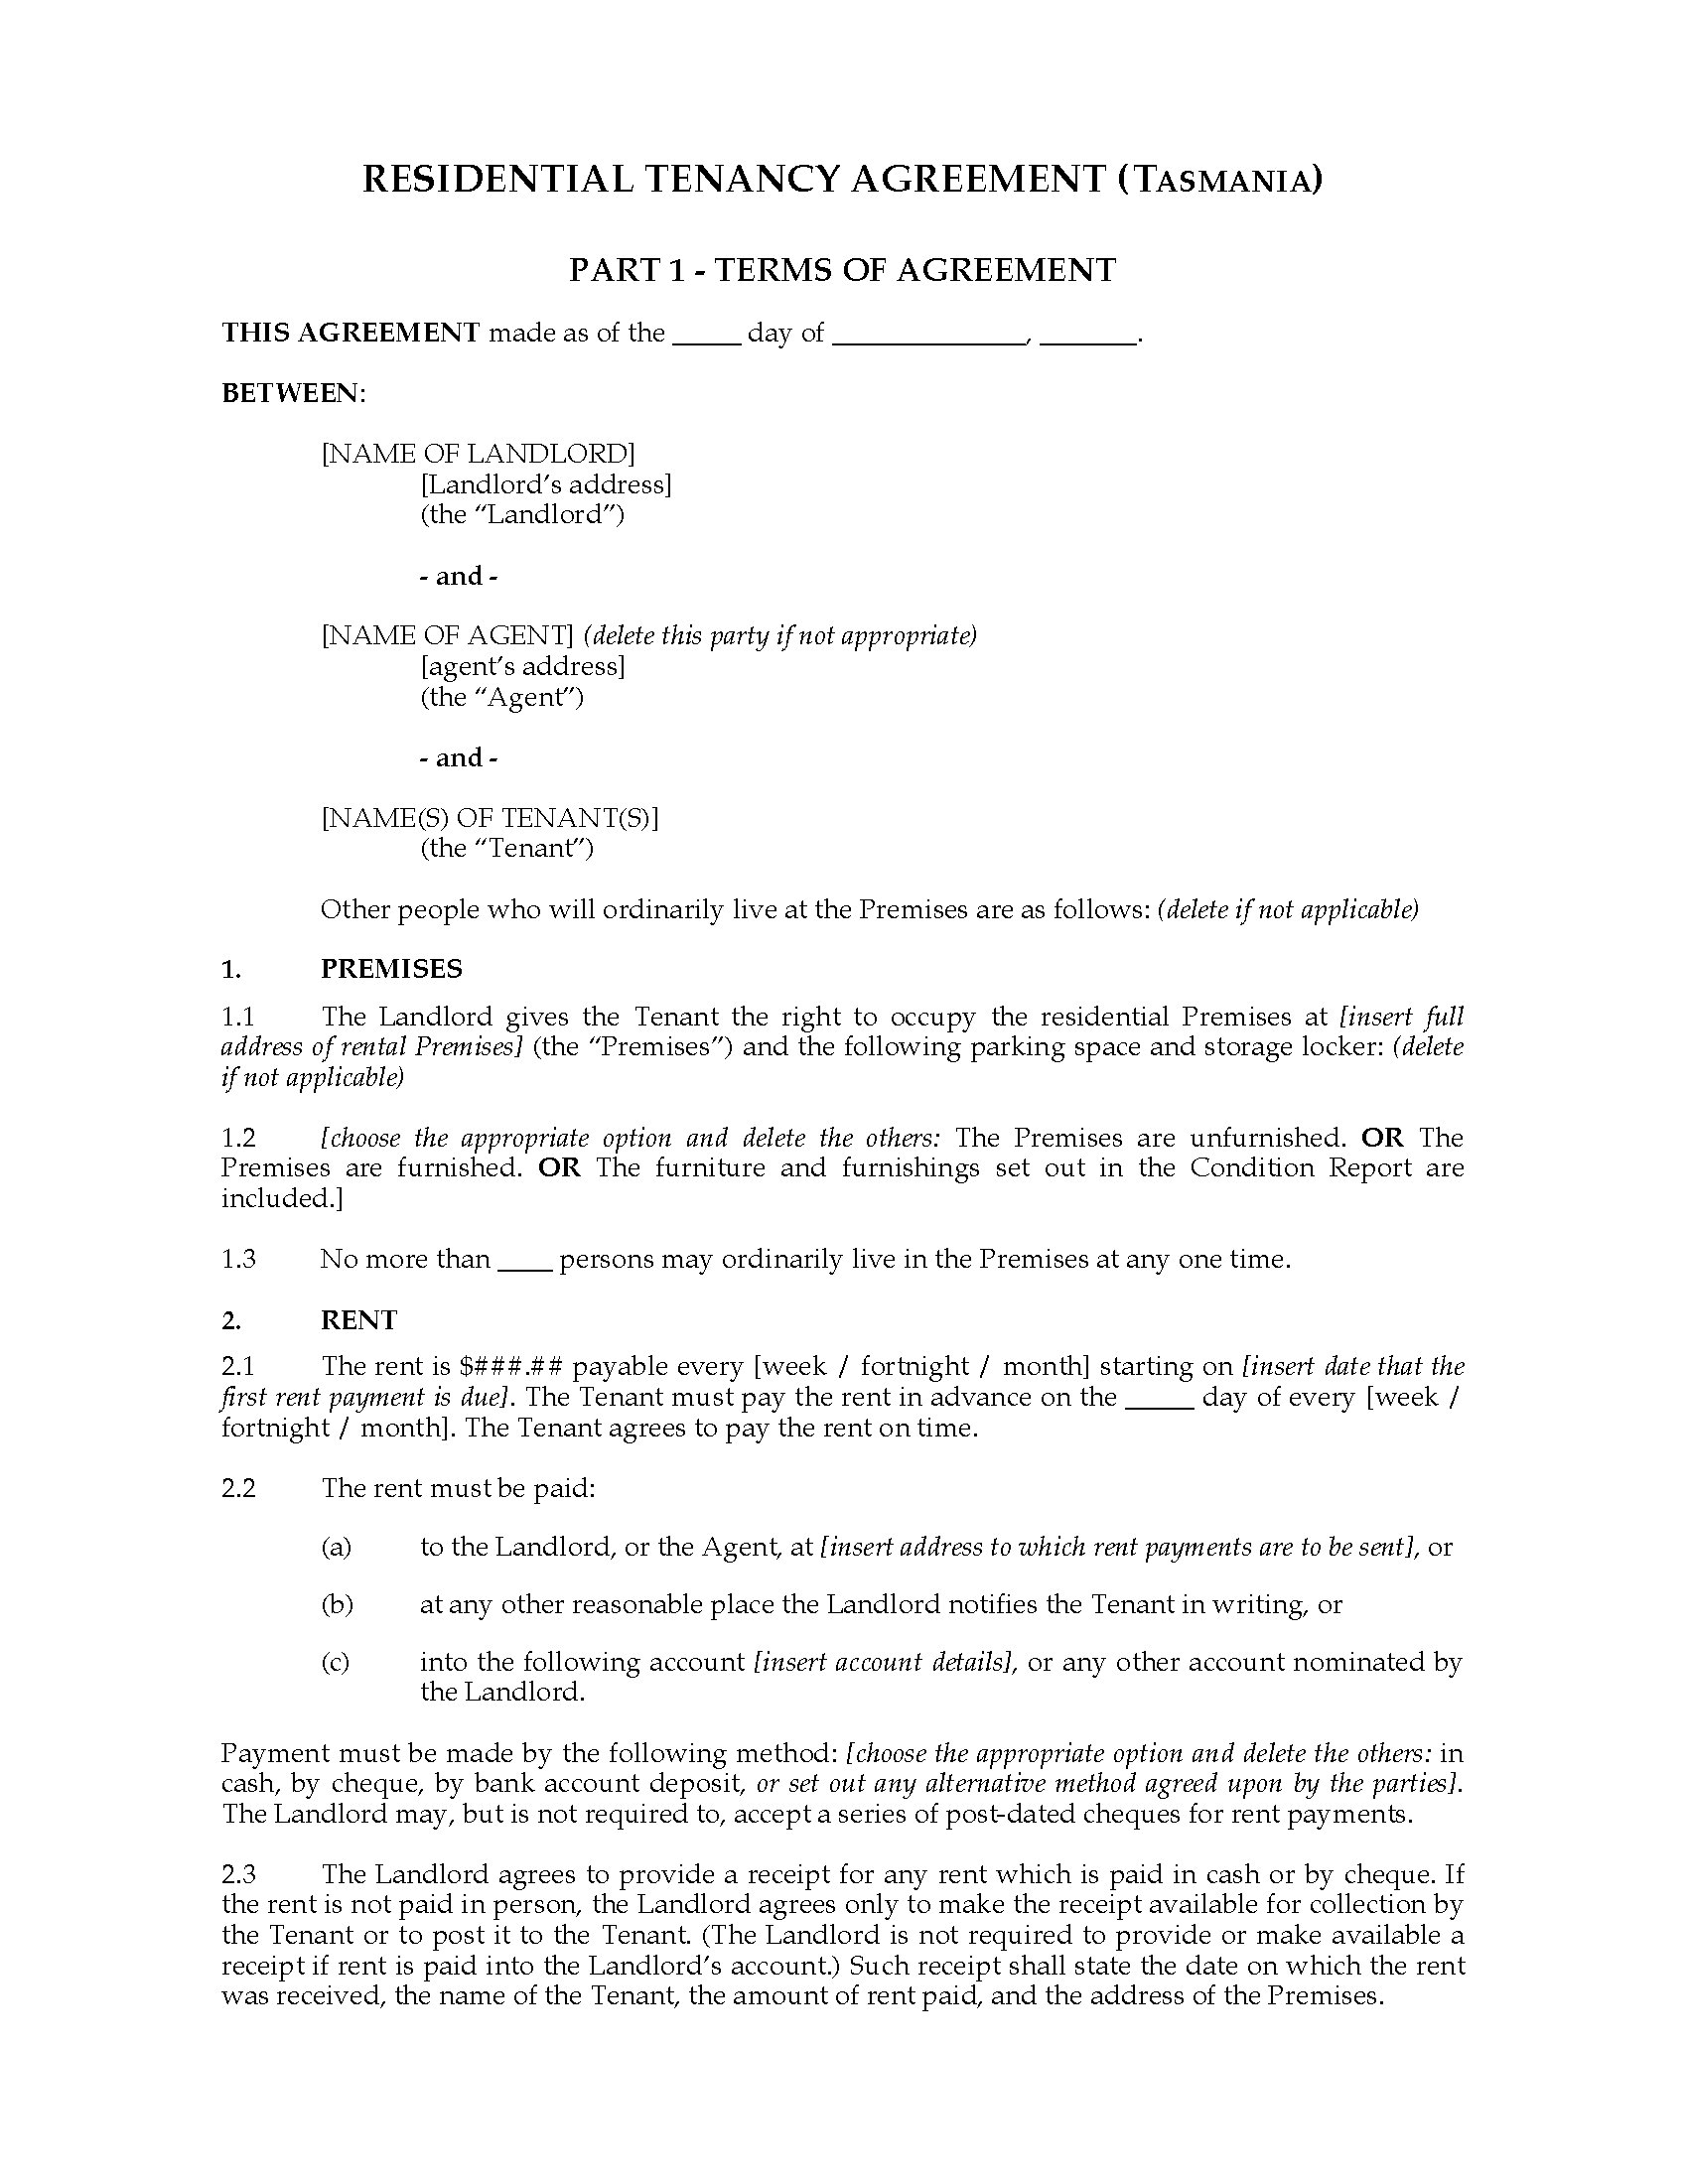 Residential Tenancy Application Form Tasmania